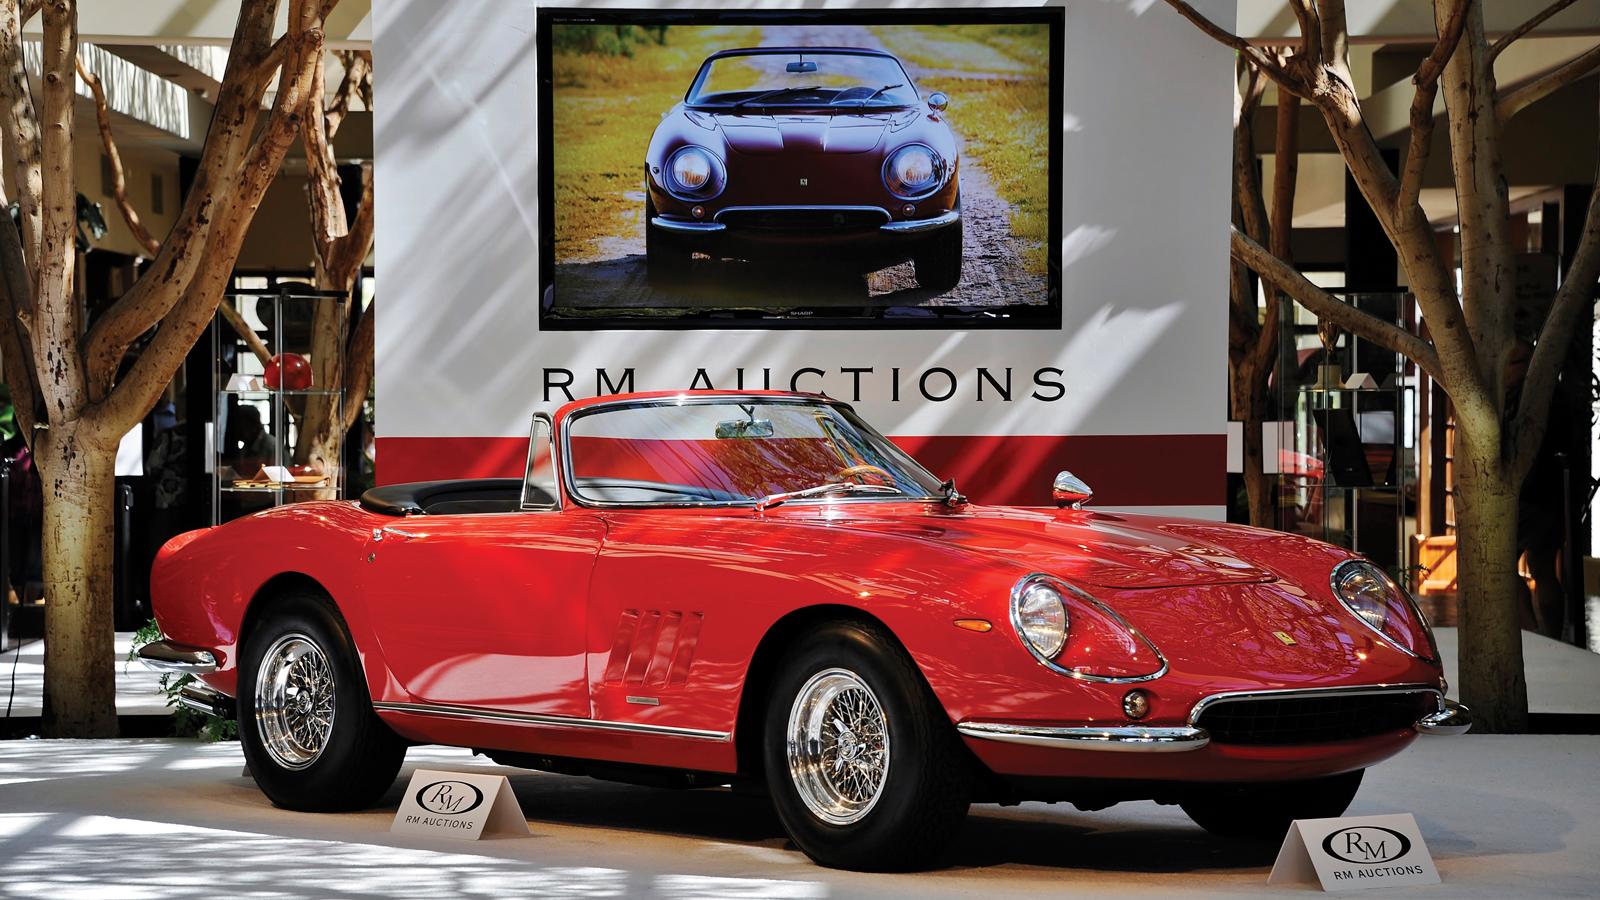 m13-auto-lot-225-1967-ferrari-GTB4S-N.A.R.T.-credit-courtesy-of-RM-Auctions